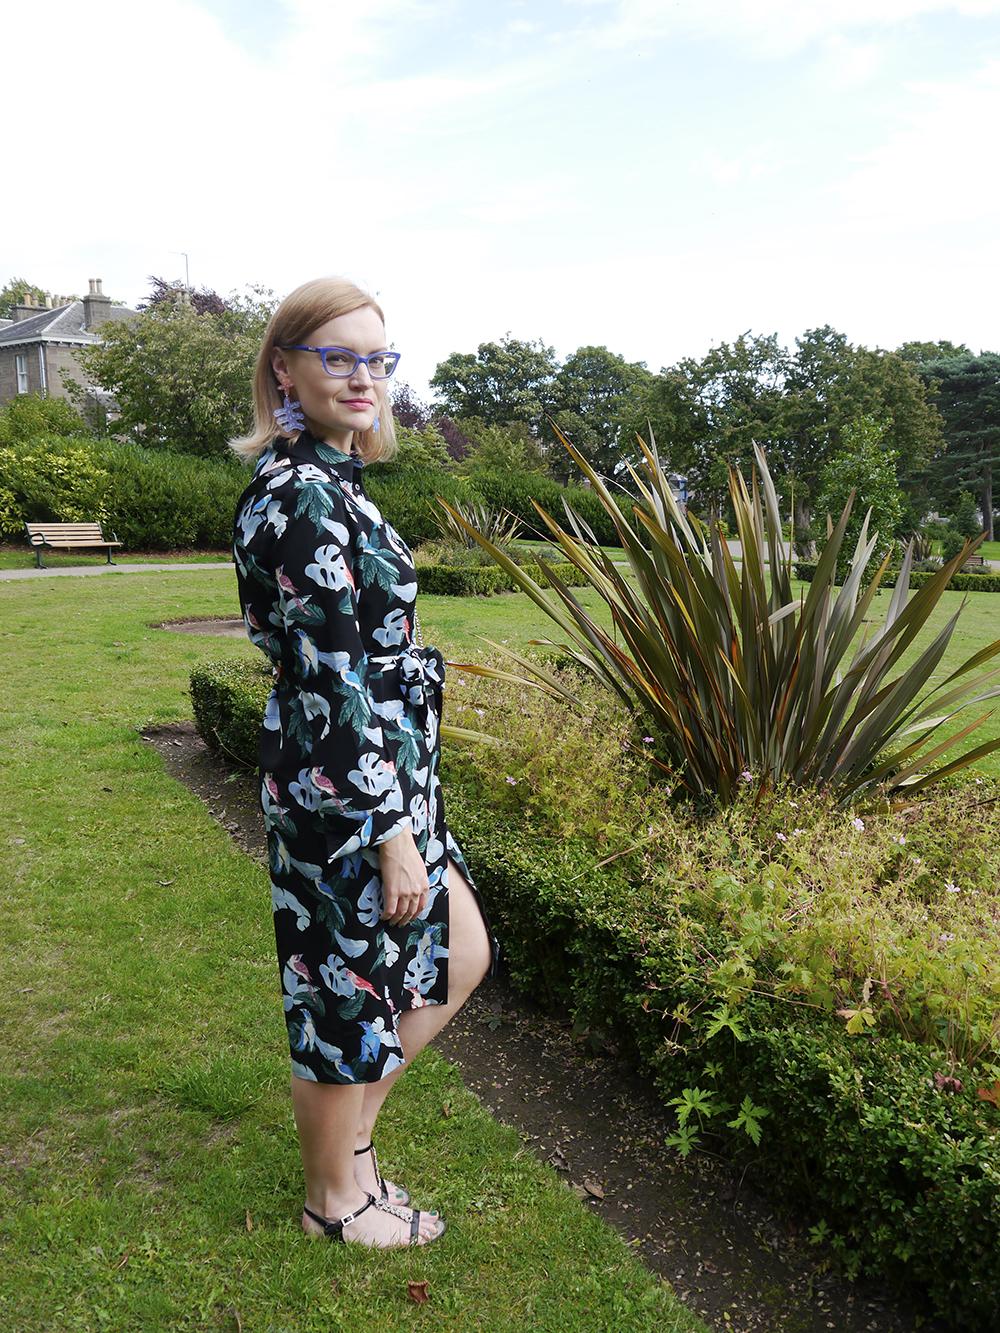 Fashion blogger Wardrobe Conversations styles a tropical Monki shirt dress with statement Julia de klerk earrings